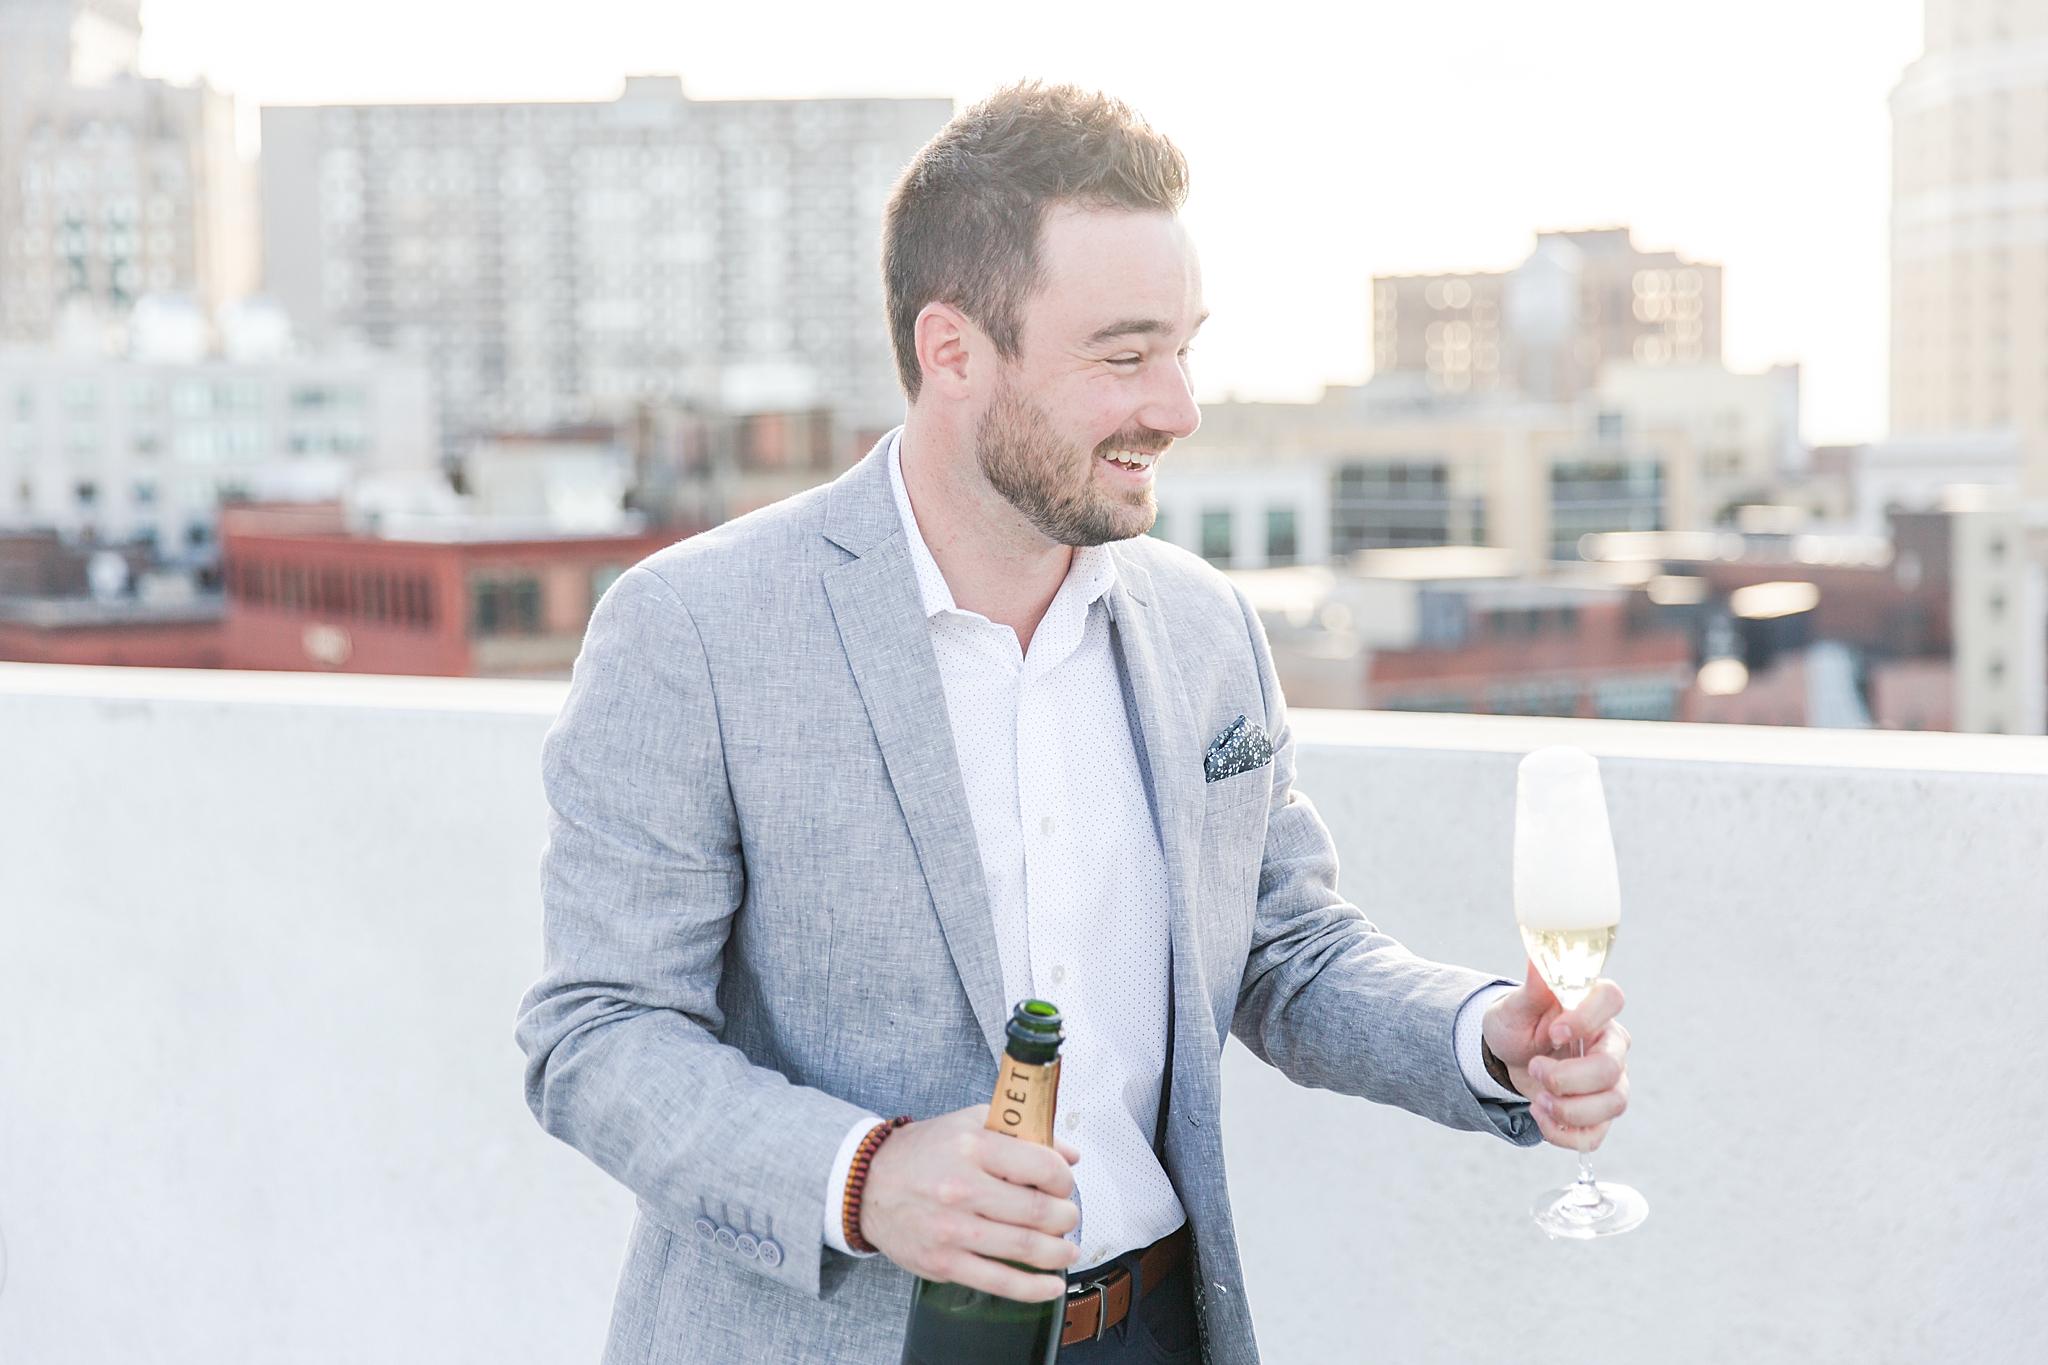 detroit-wedding-photographer-downtown-detroit-belle-isle-engagement-photos-sarah-eric-by-courtney-carolyn-photography_0015.jpg